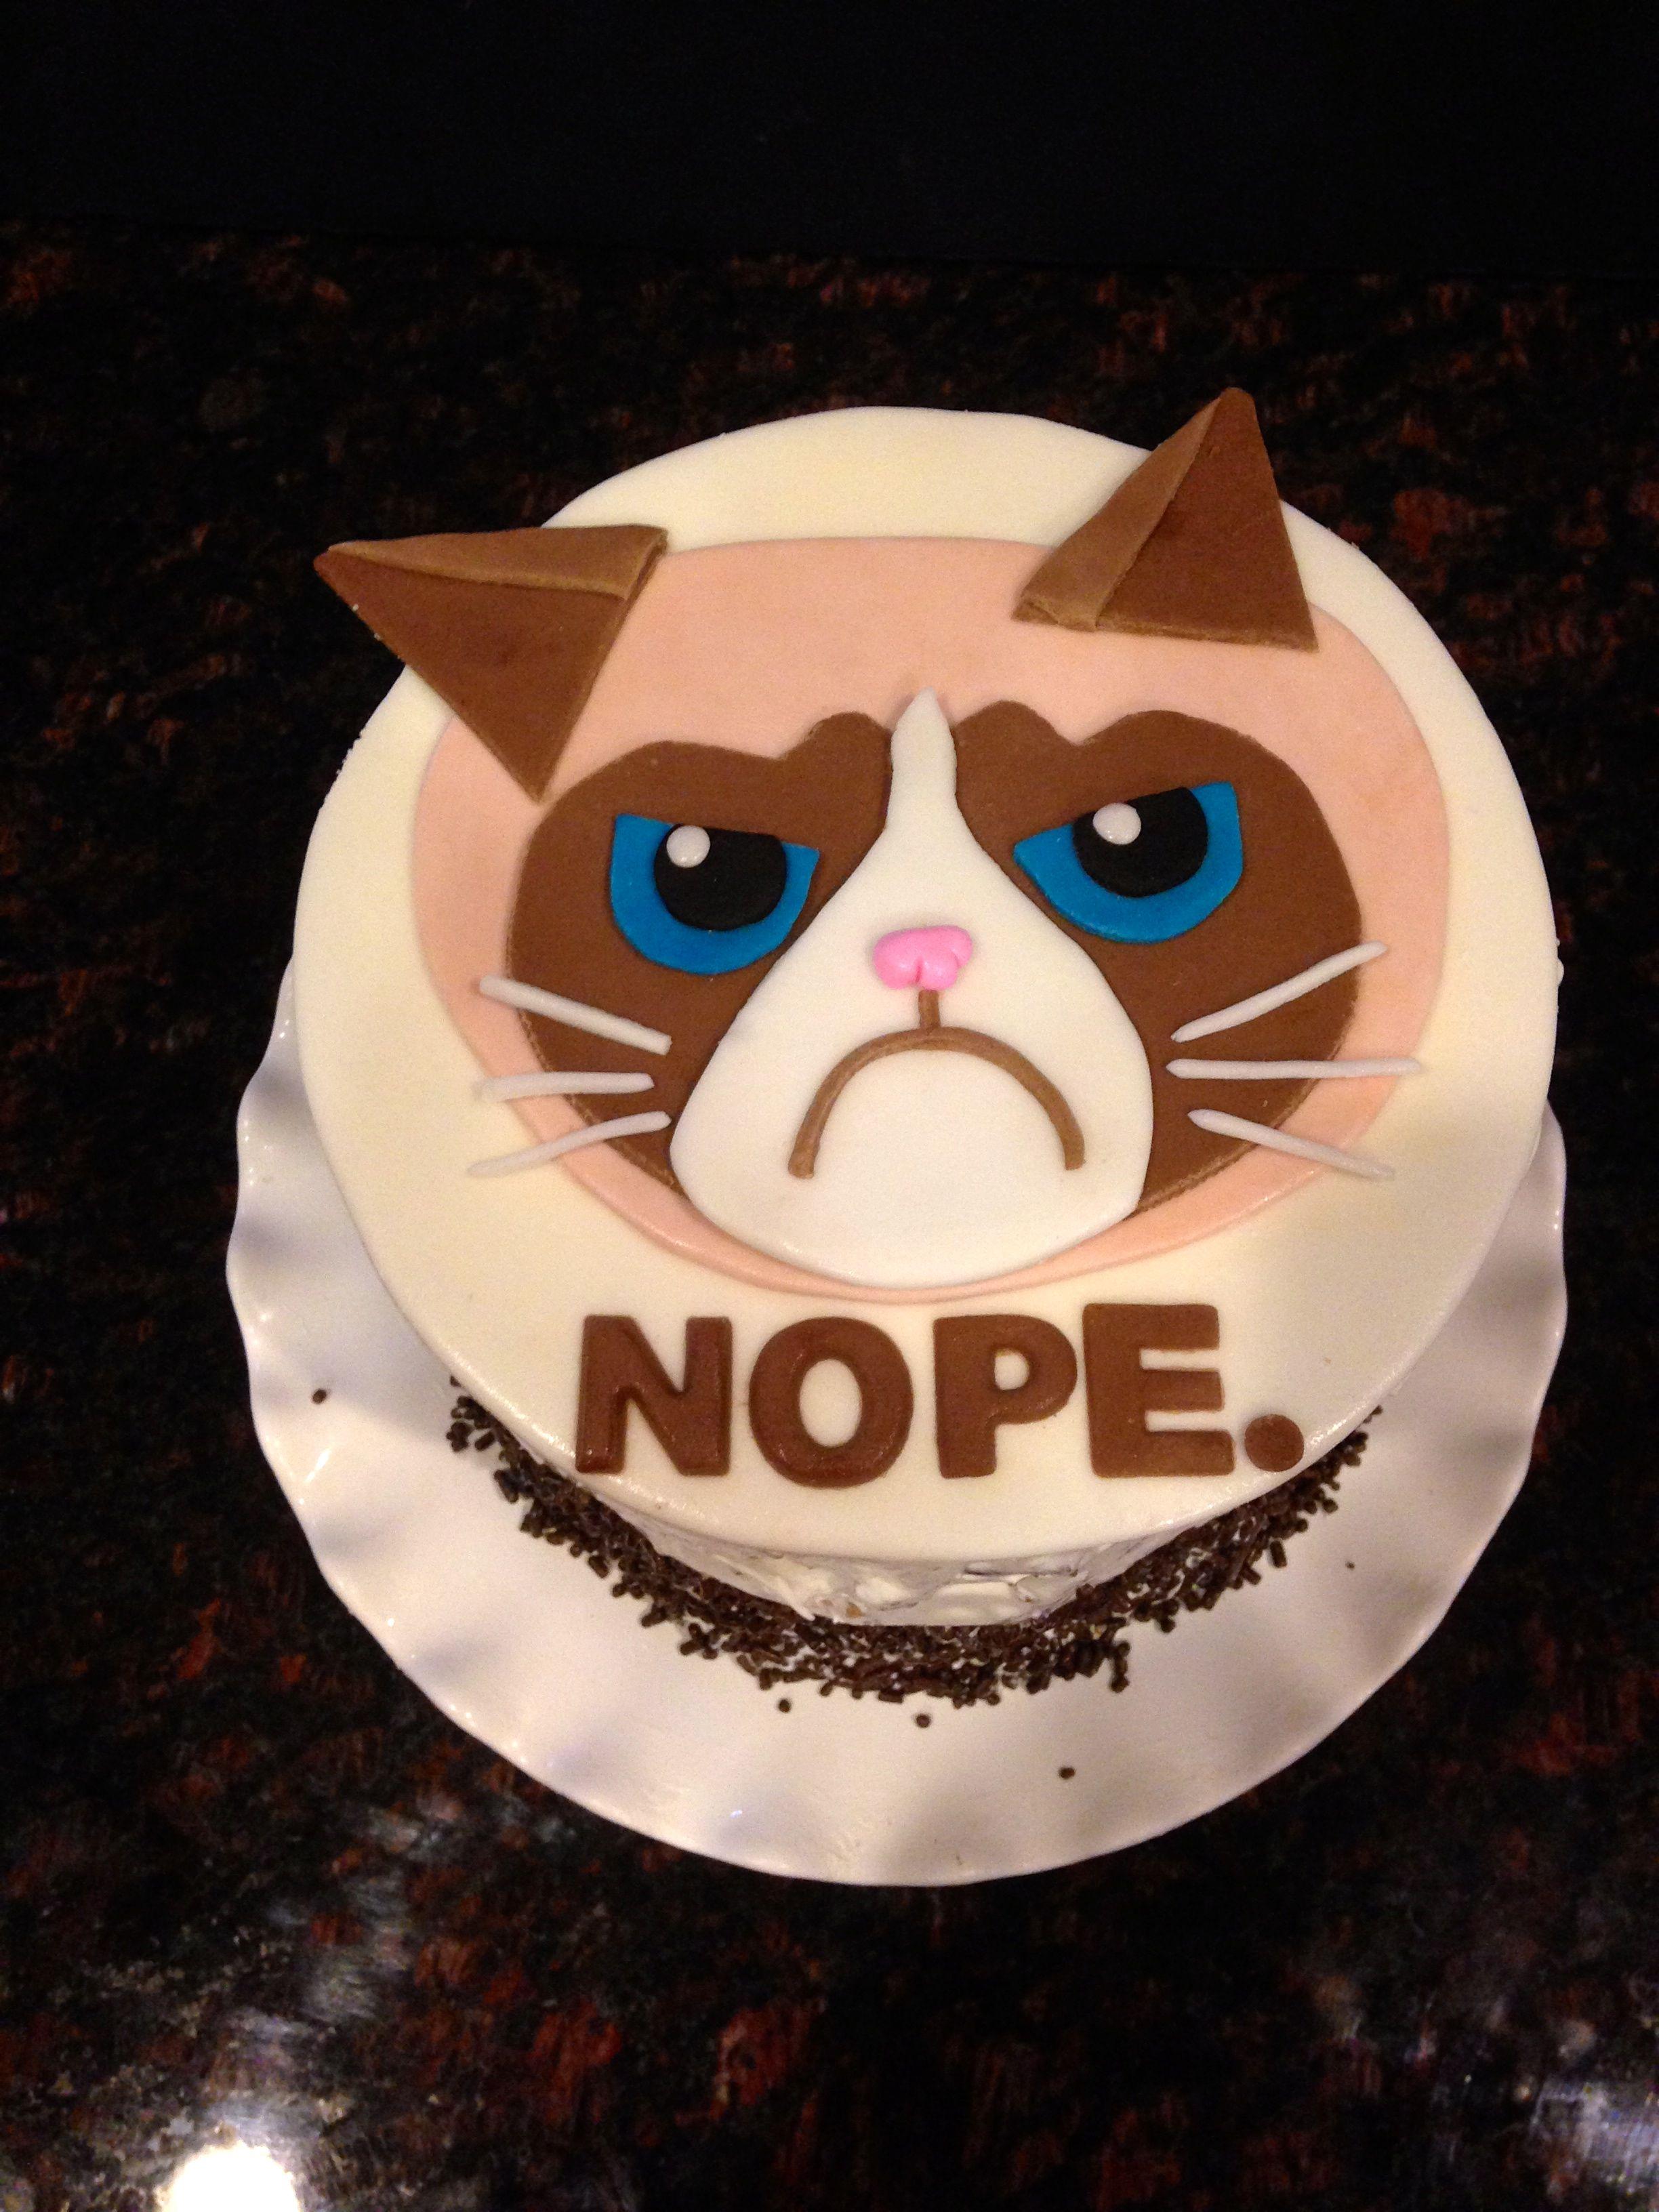 Birthday Cakes - My 39th Birthday Cake…Grumpy Cat (my favorite!)